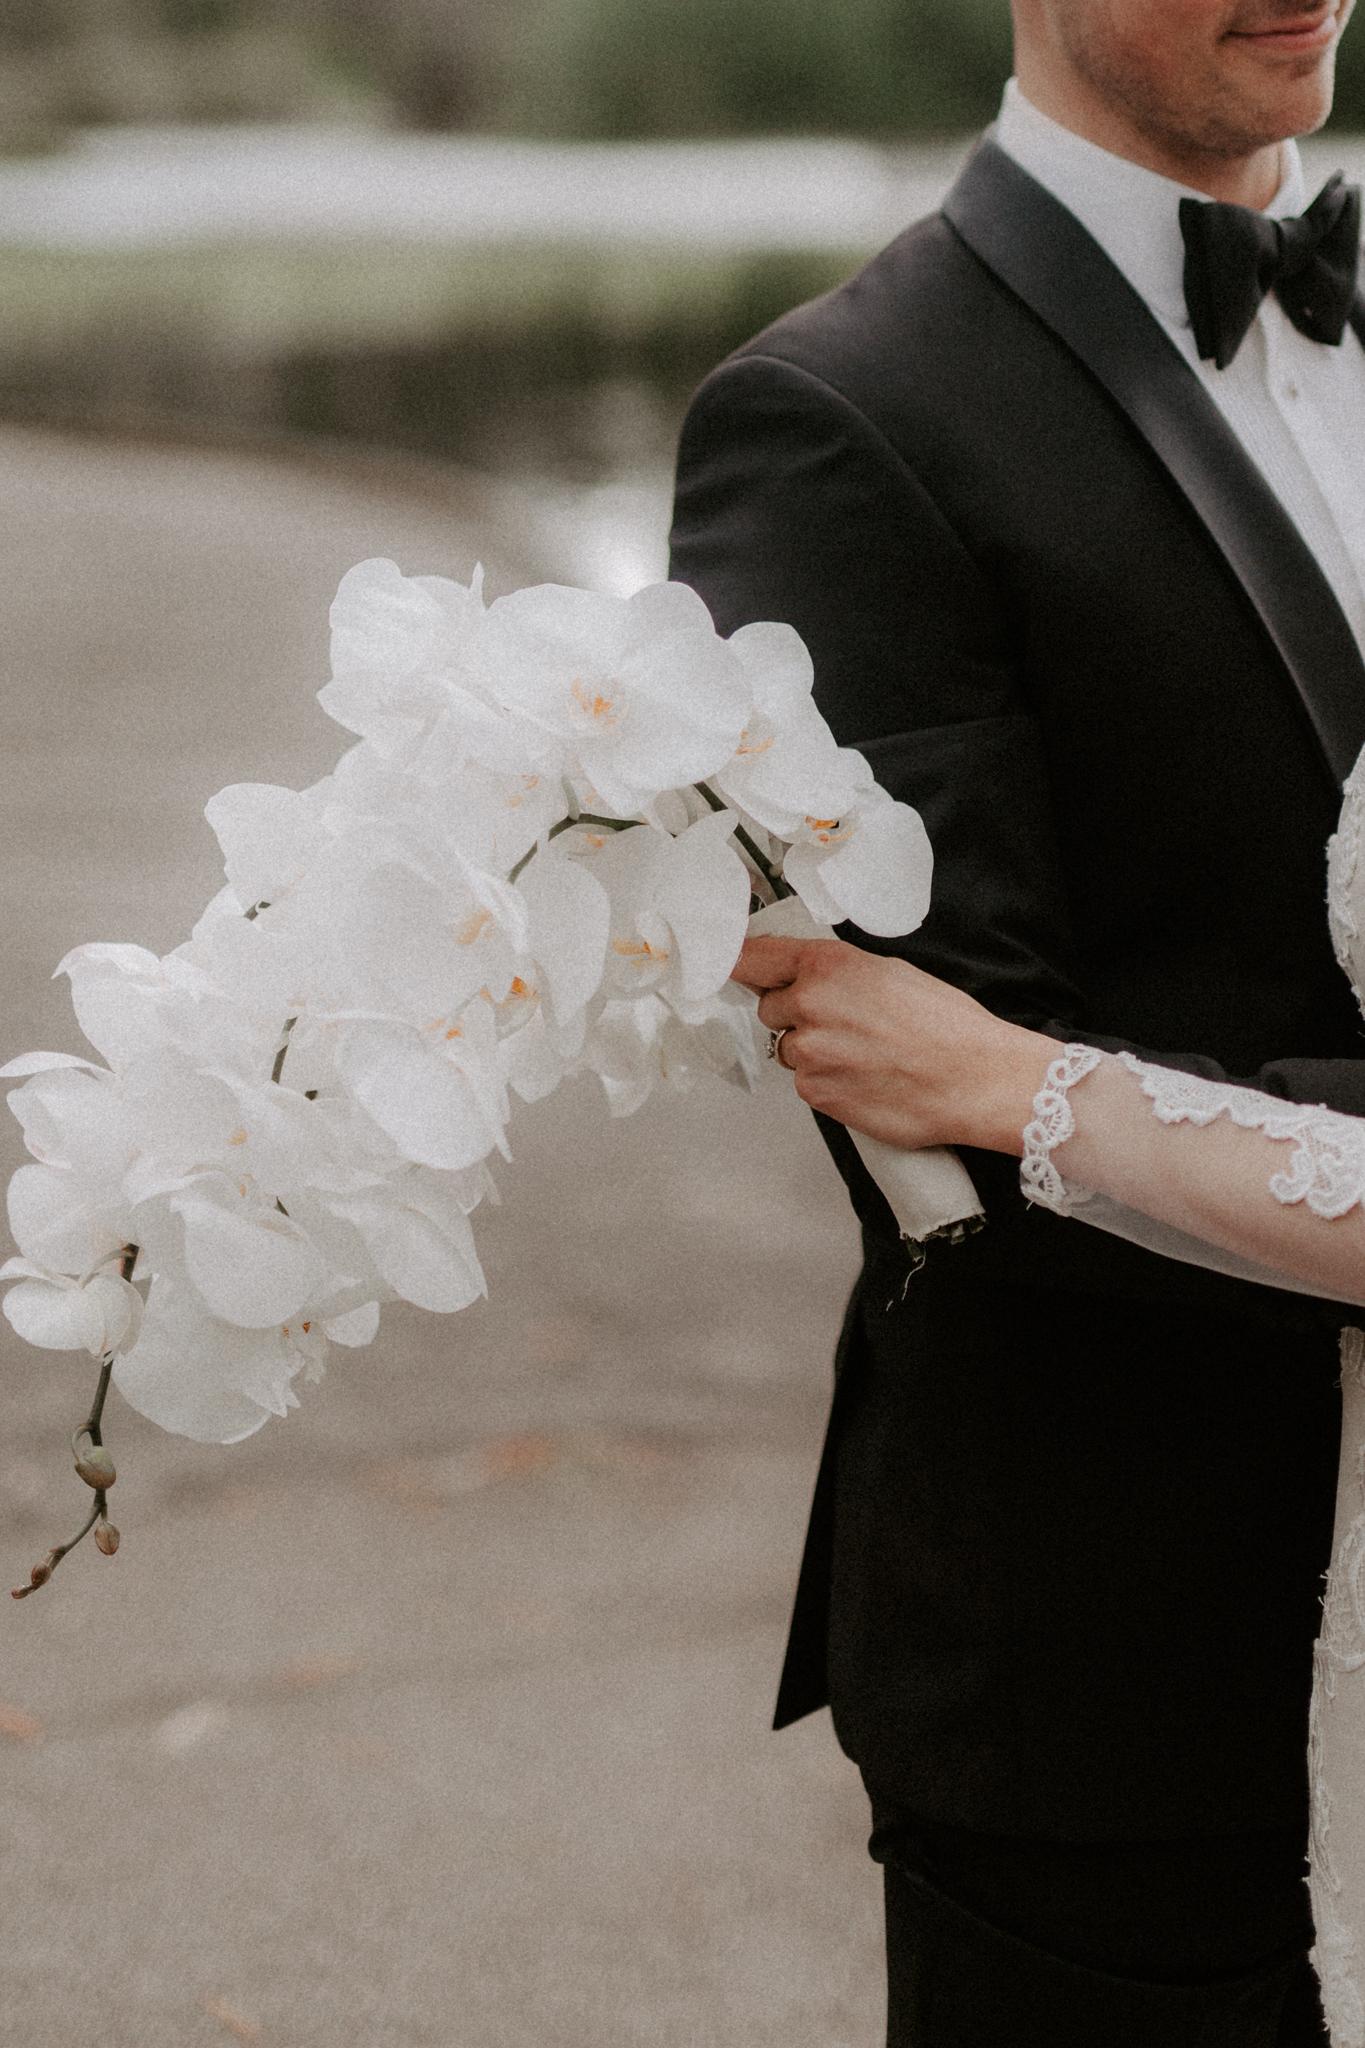 The-Terrace-Royal-Botanic-Gardens-Wedding-Emotions-and-Math-Photography-093.jpg